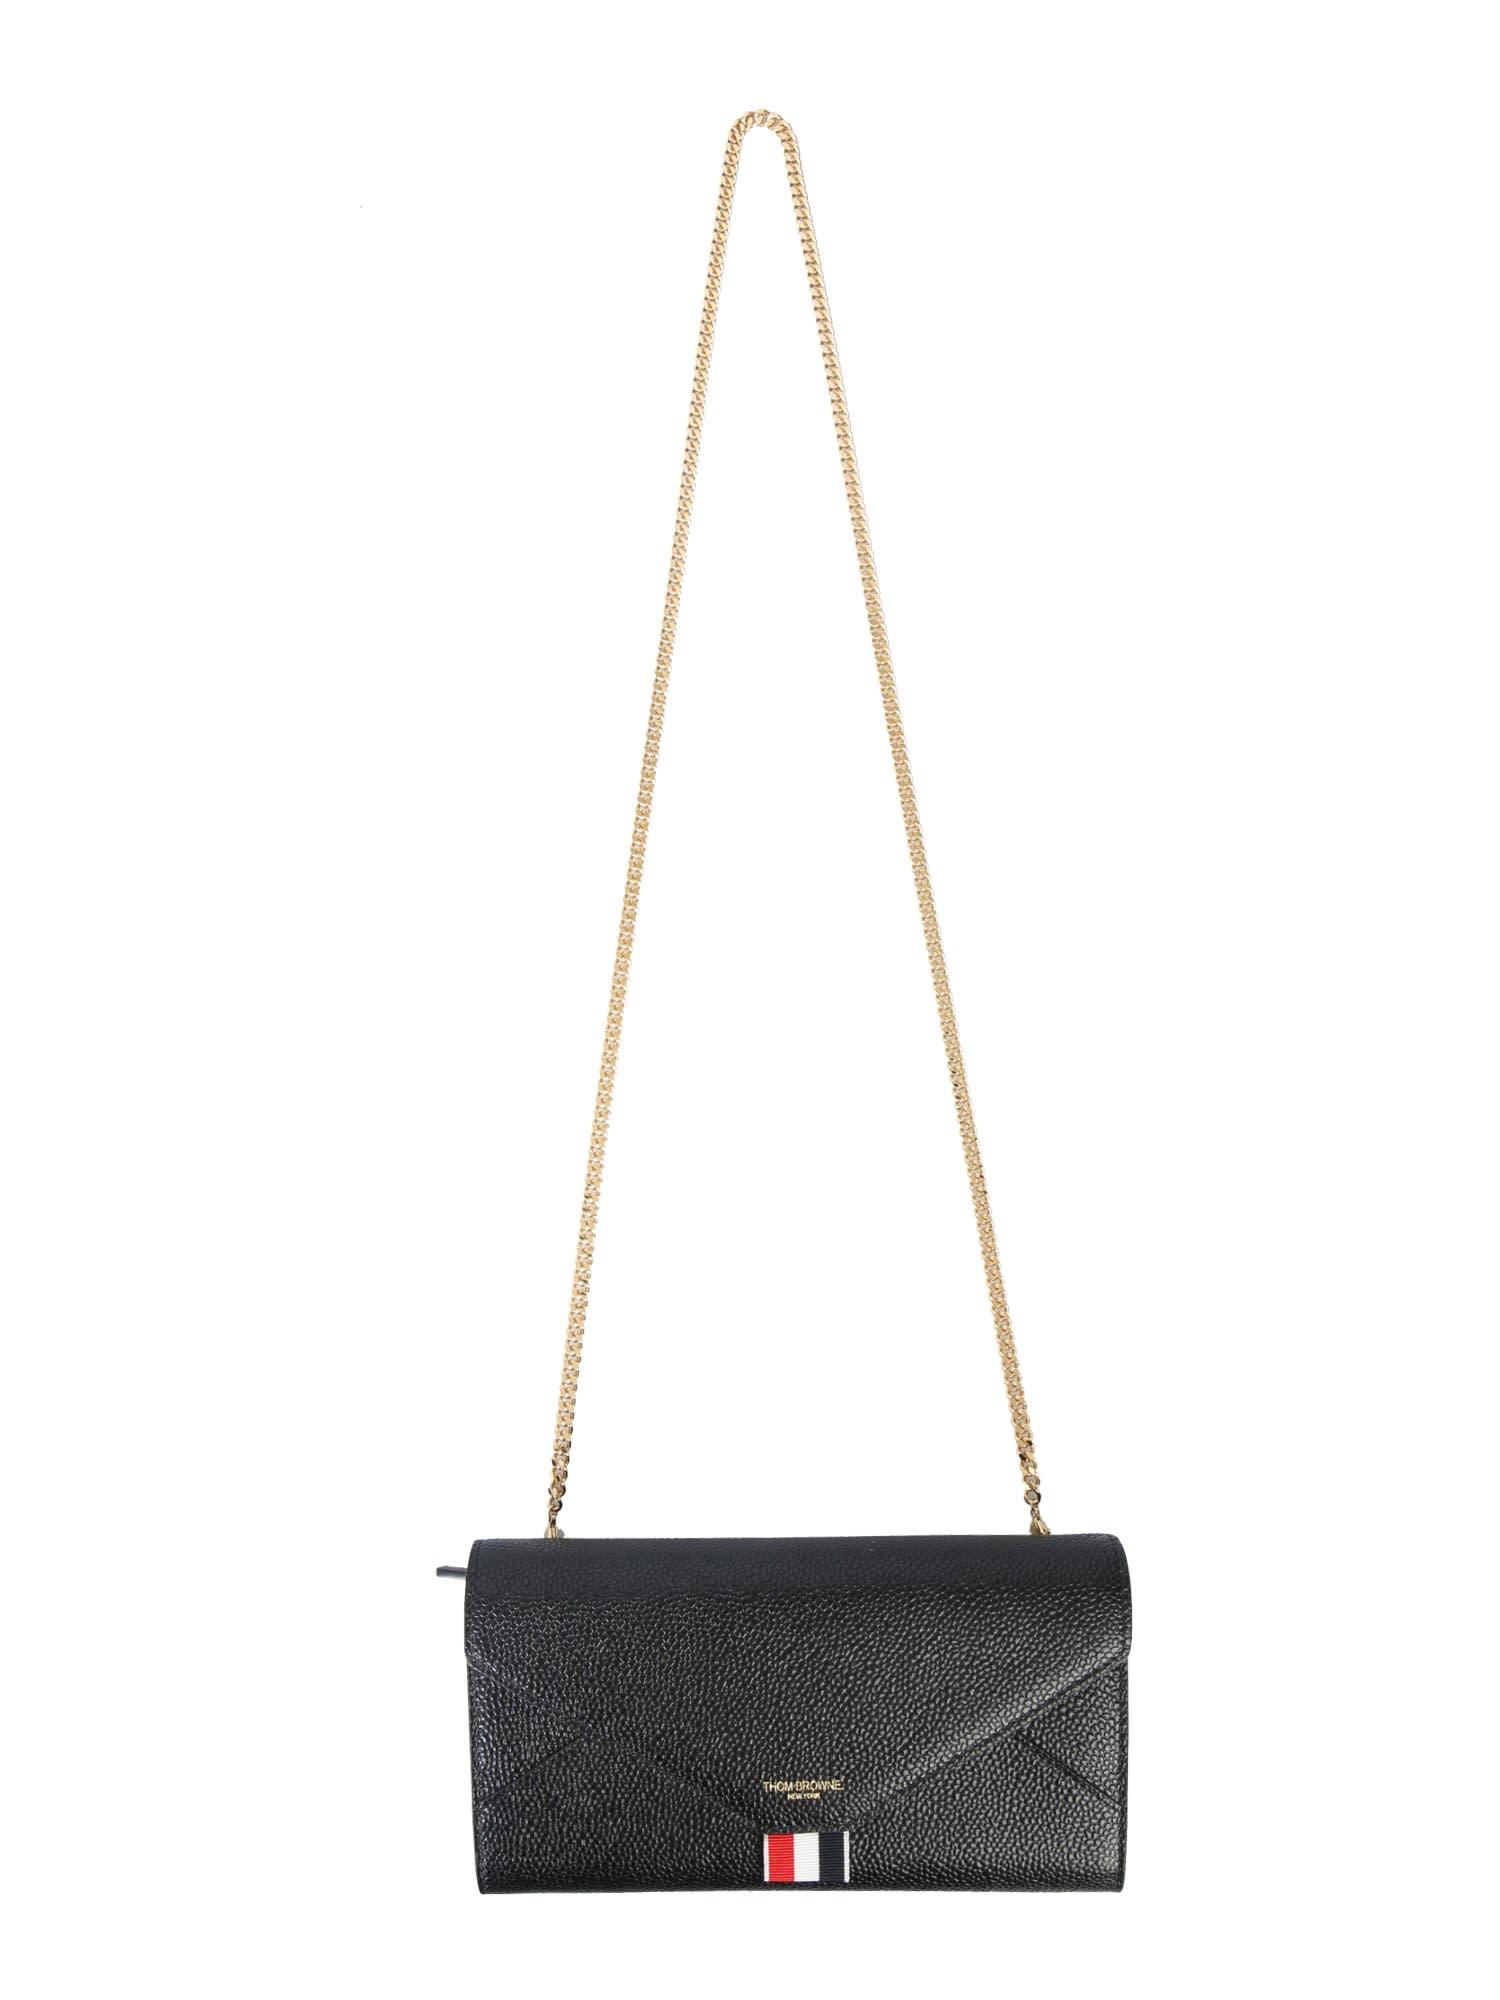 Thom Browne Wallet With Shoulder Strap